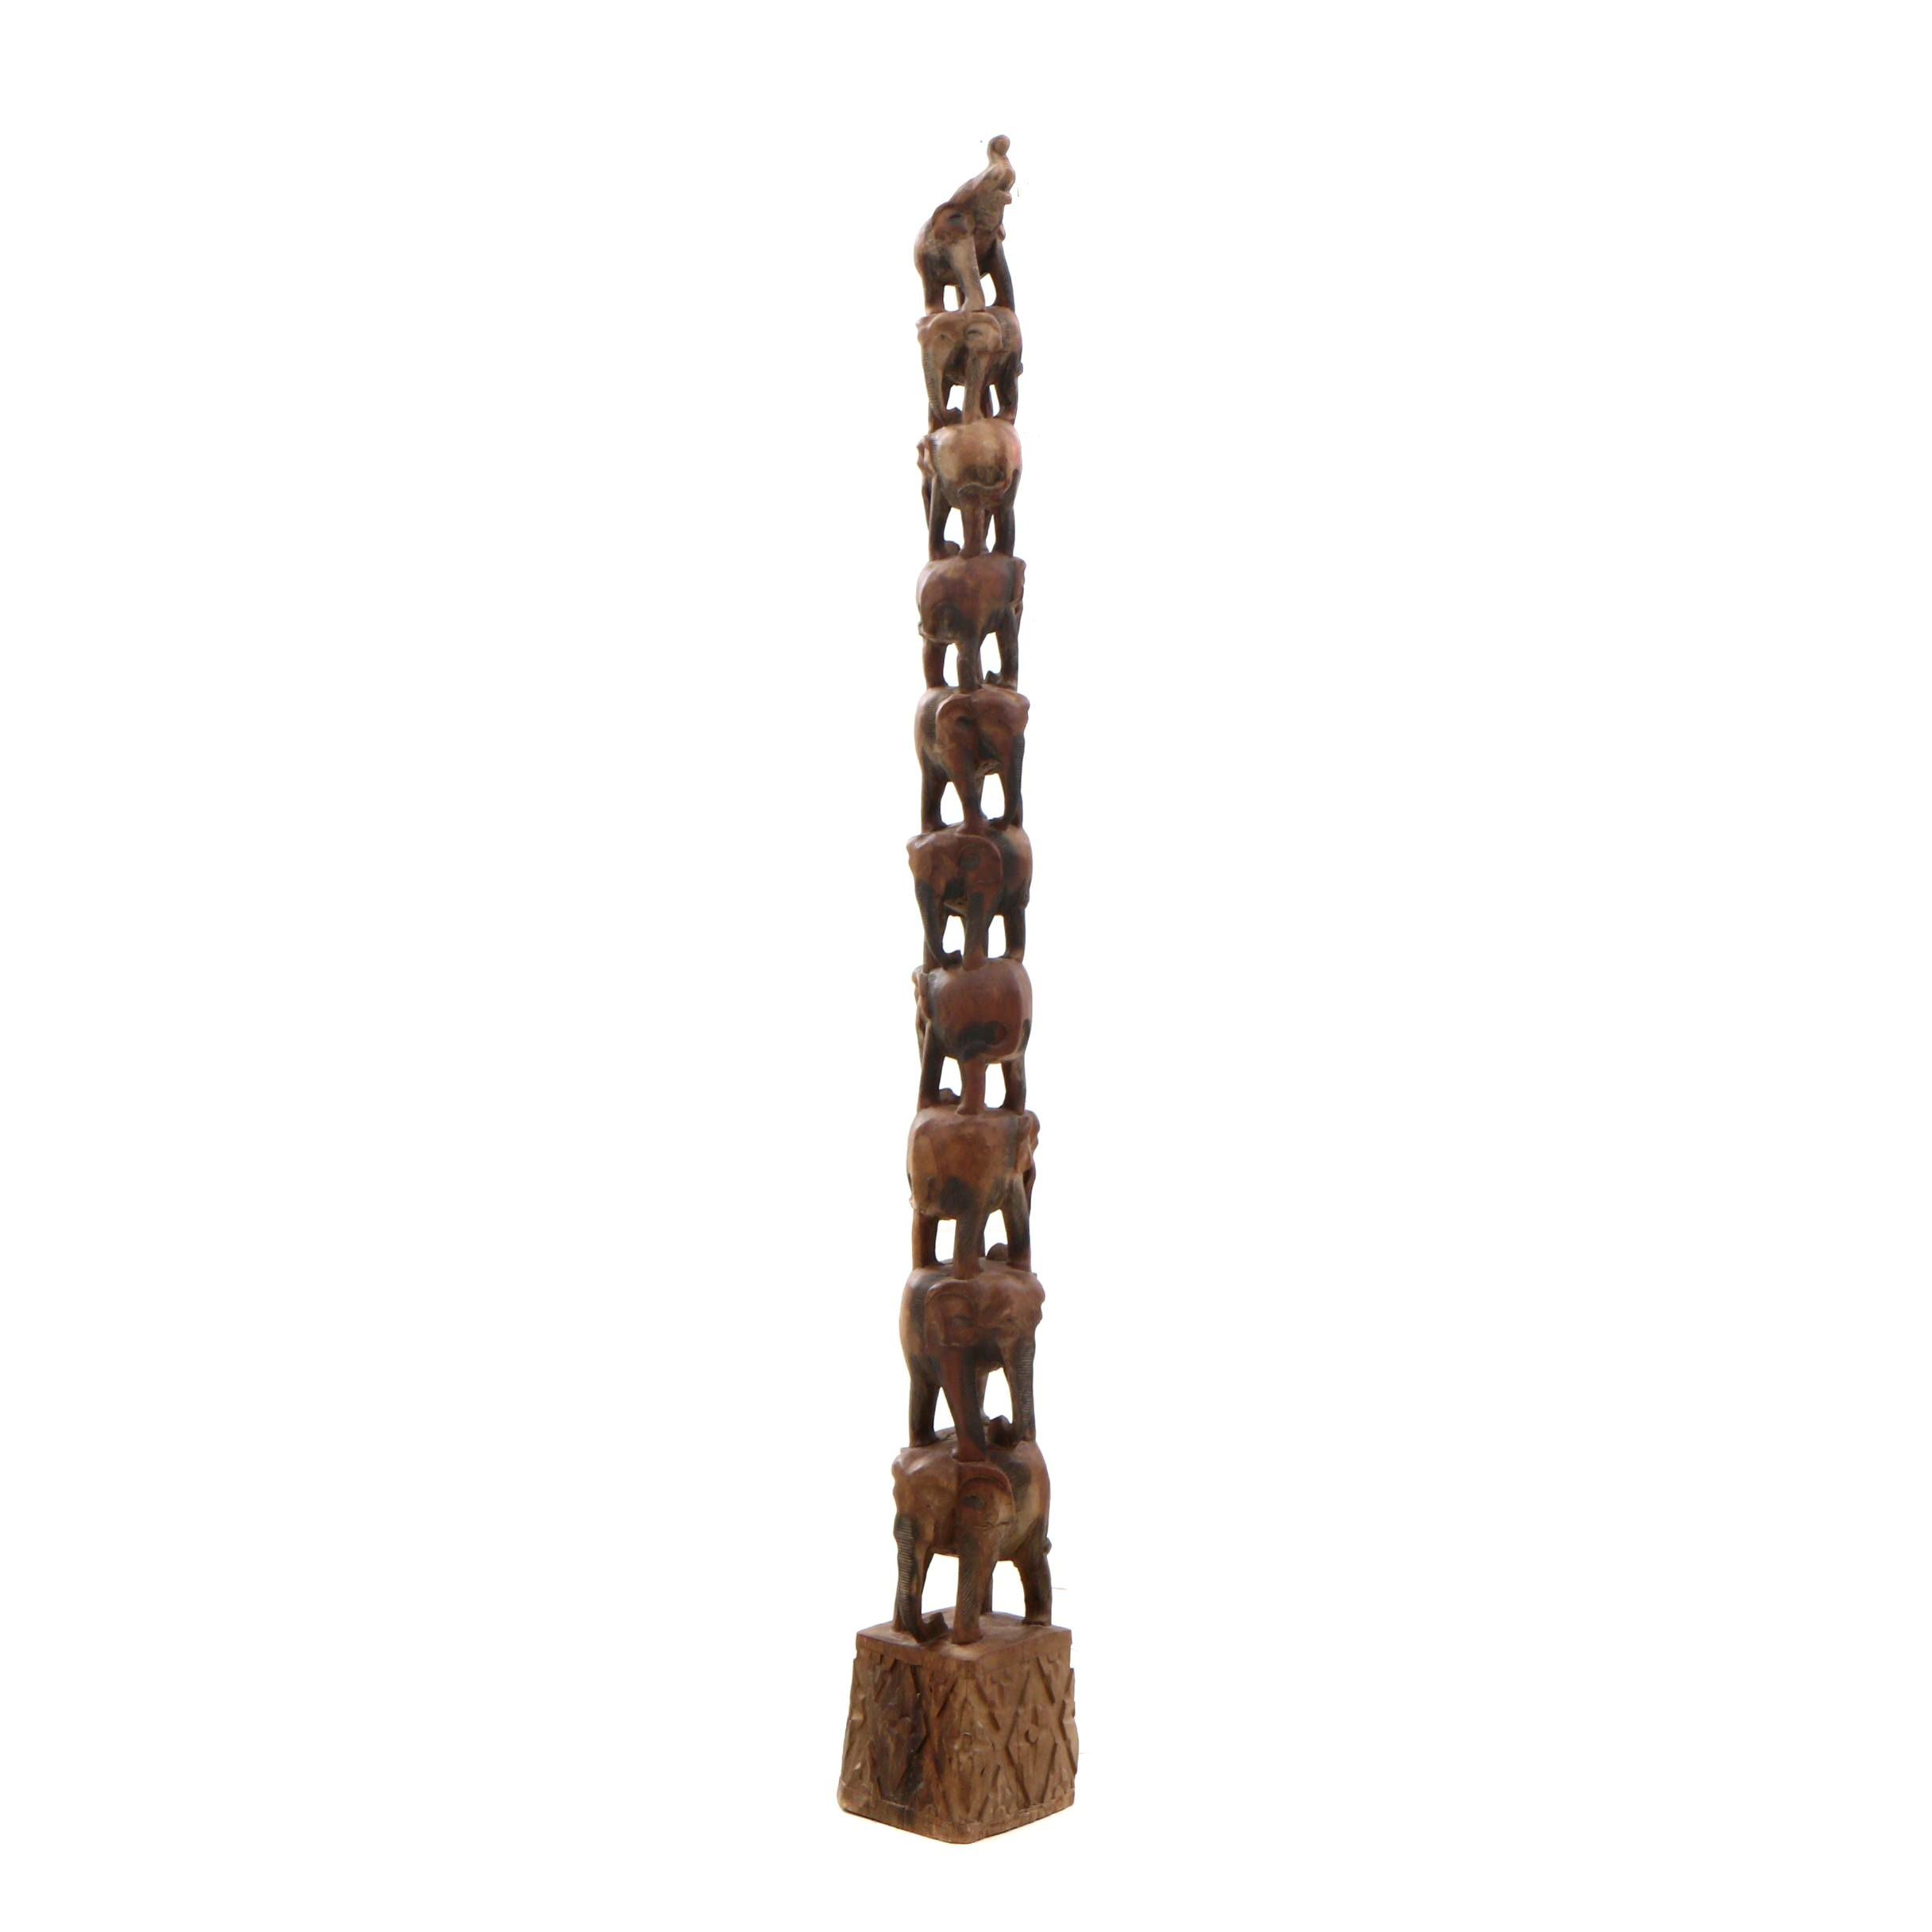 Carved Exotic Hardwood Figural Elephant Tower